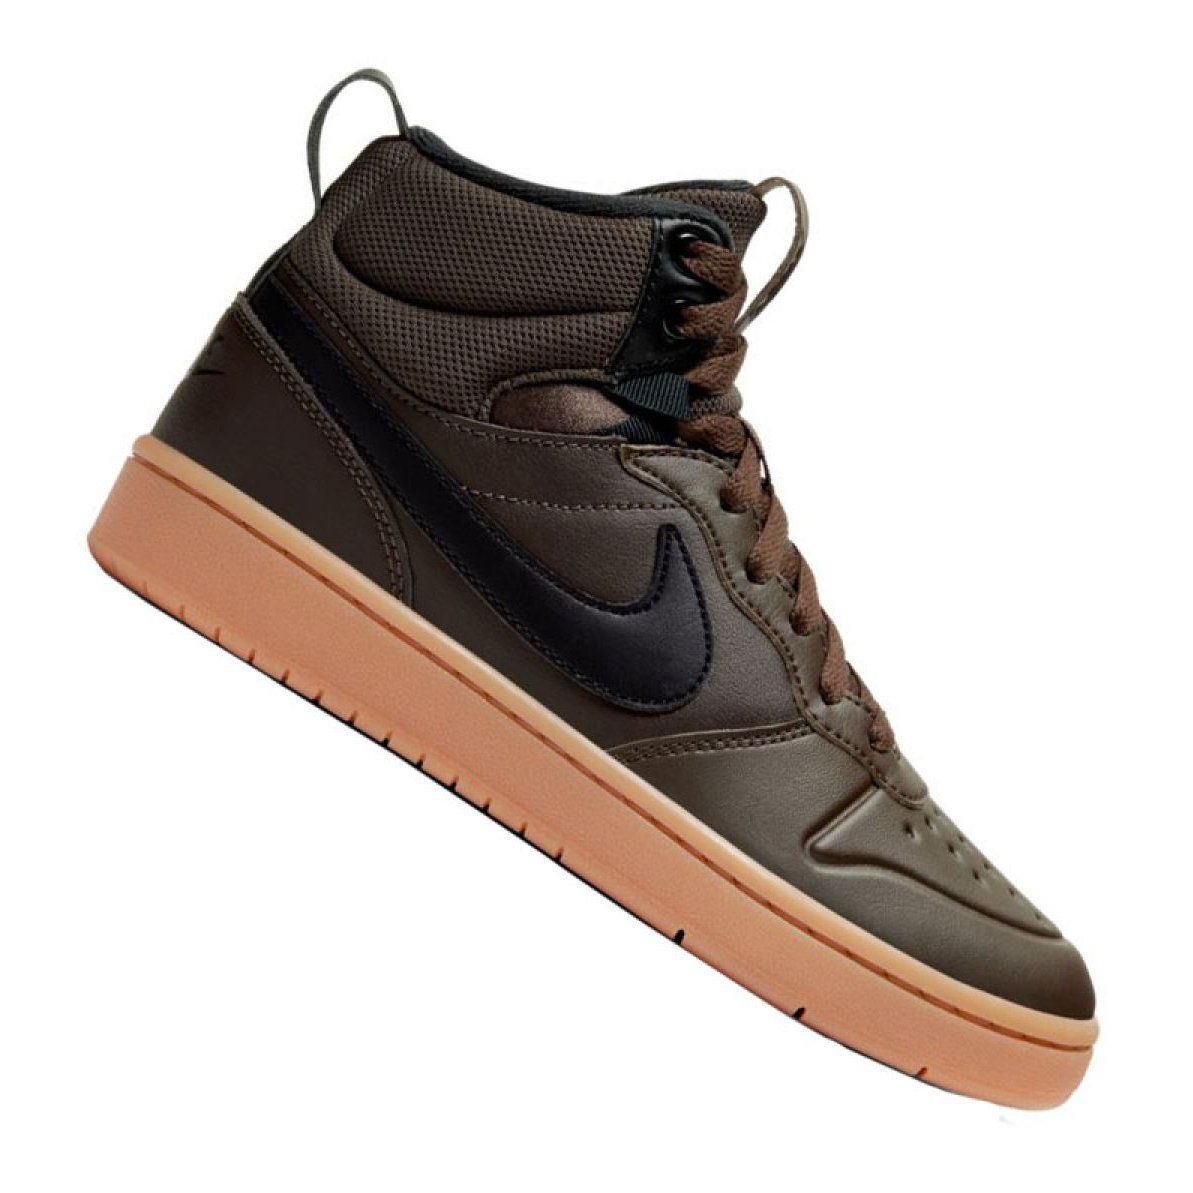 Buty Nike Court Borough Mid 2 Boot Gs Jr Bq5440 200 Czarne Black Shoes Junior Shoes Nike